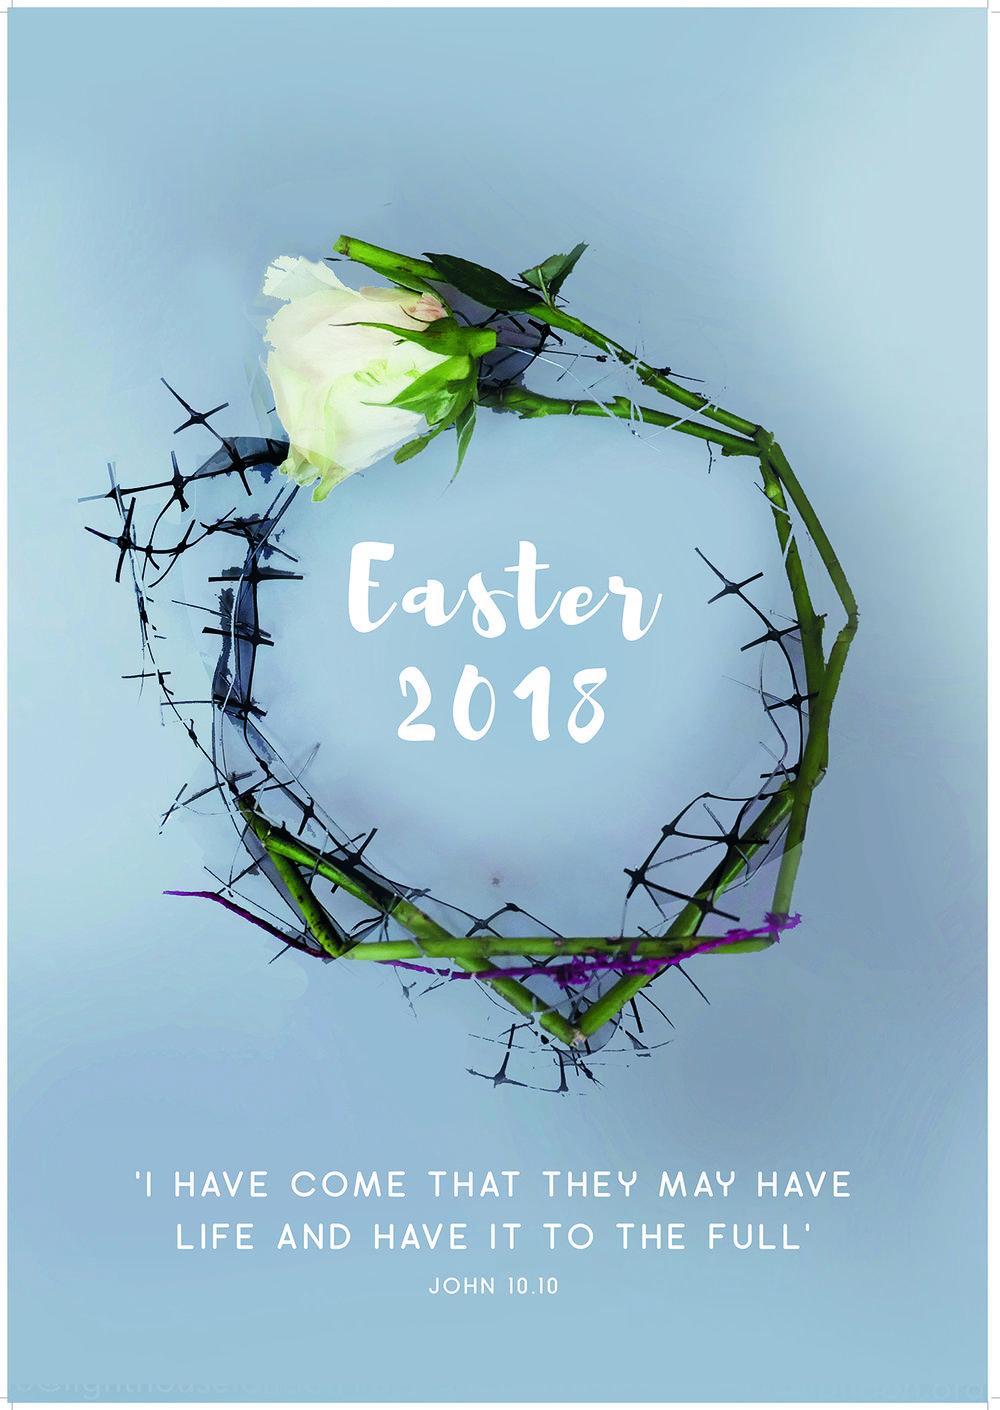 2018_Easter_A6 flyer_Front.jpg